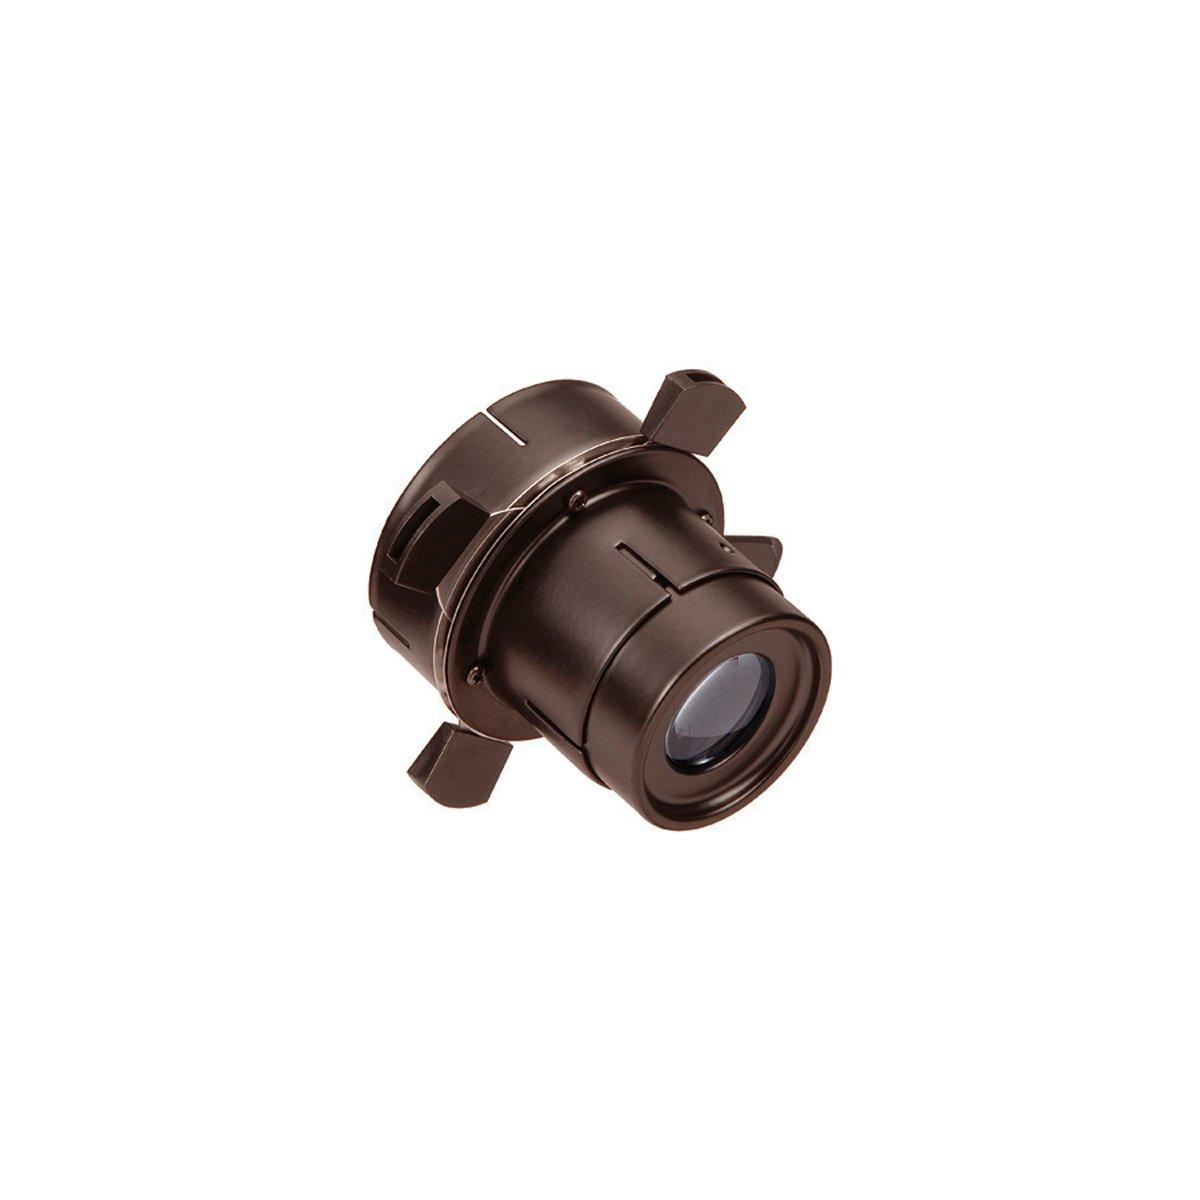 WAC Lighting 008FP-DB Framing Projector for Track and Display lighting, Dark Bronze